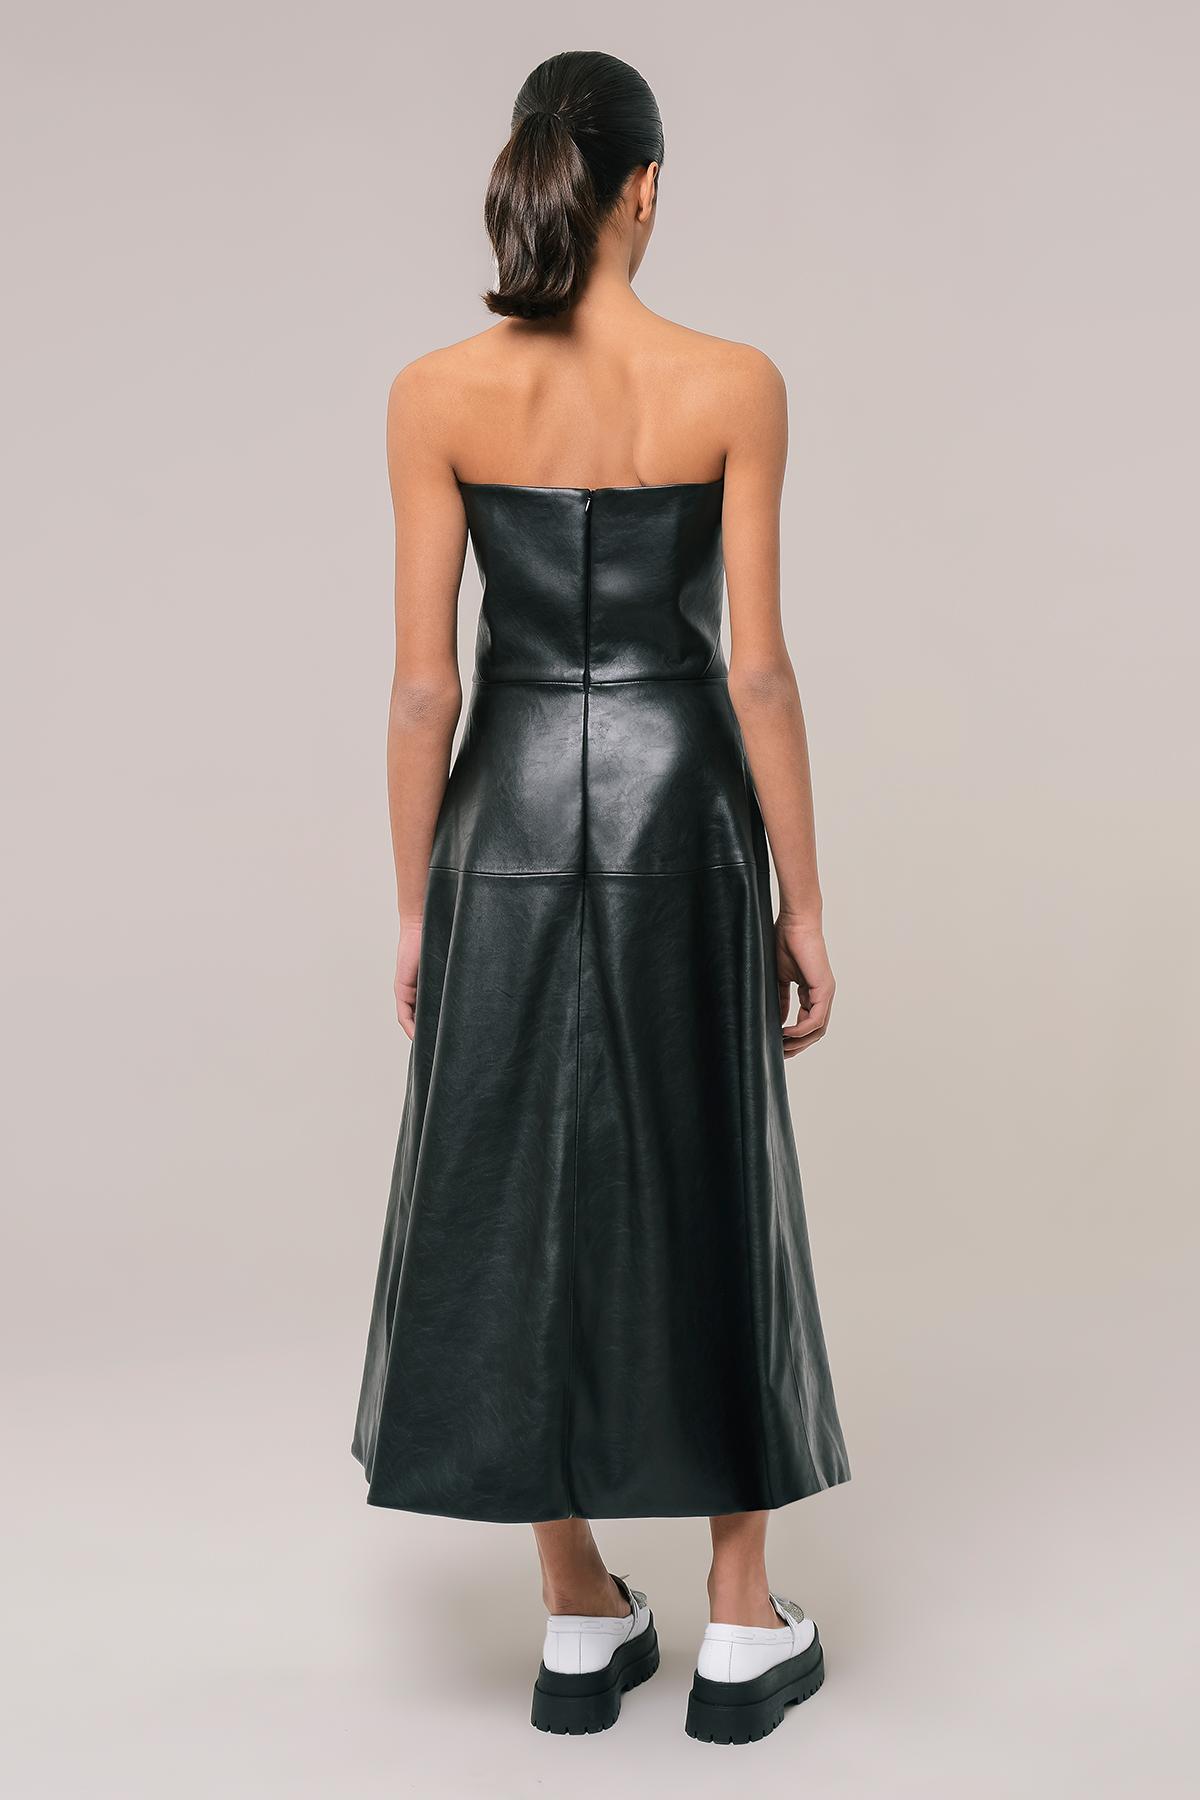 Vegan leather corset dress 2